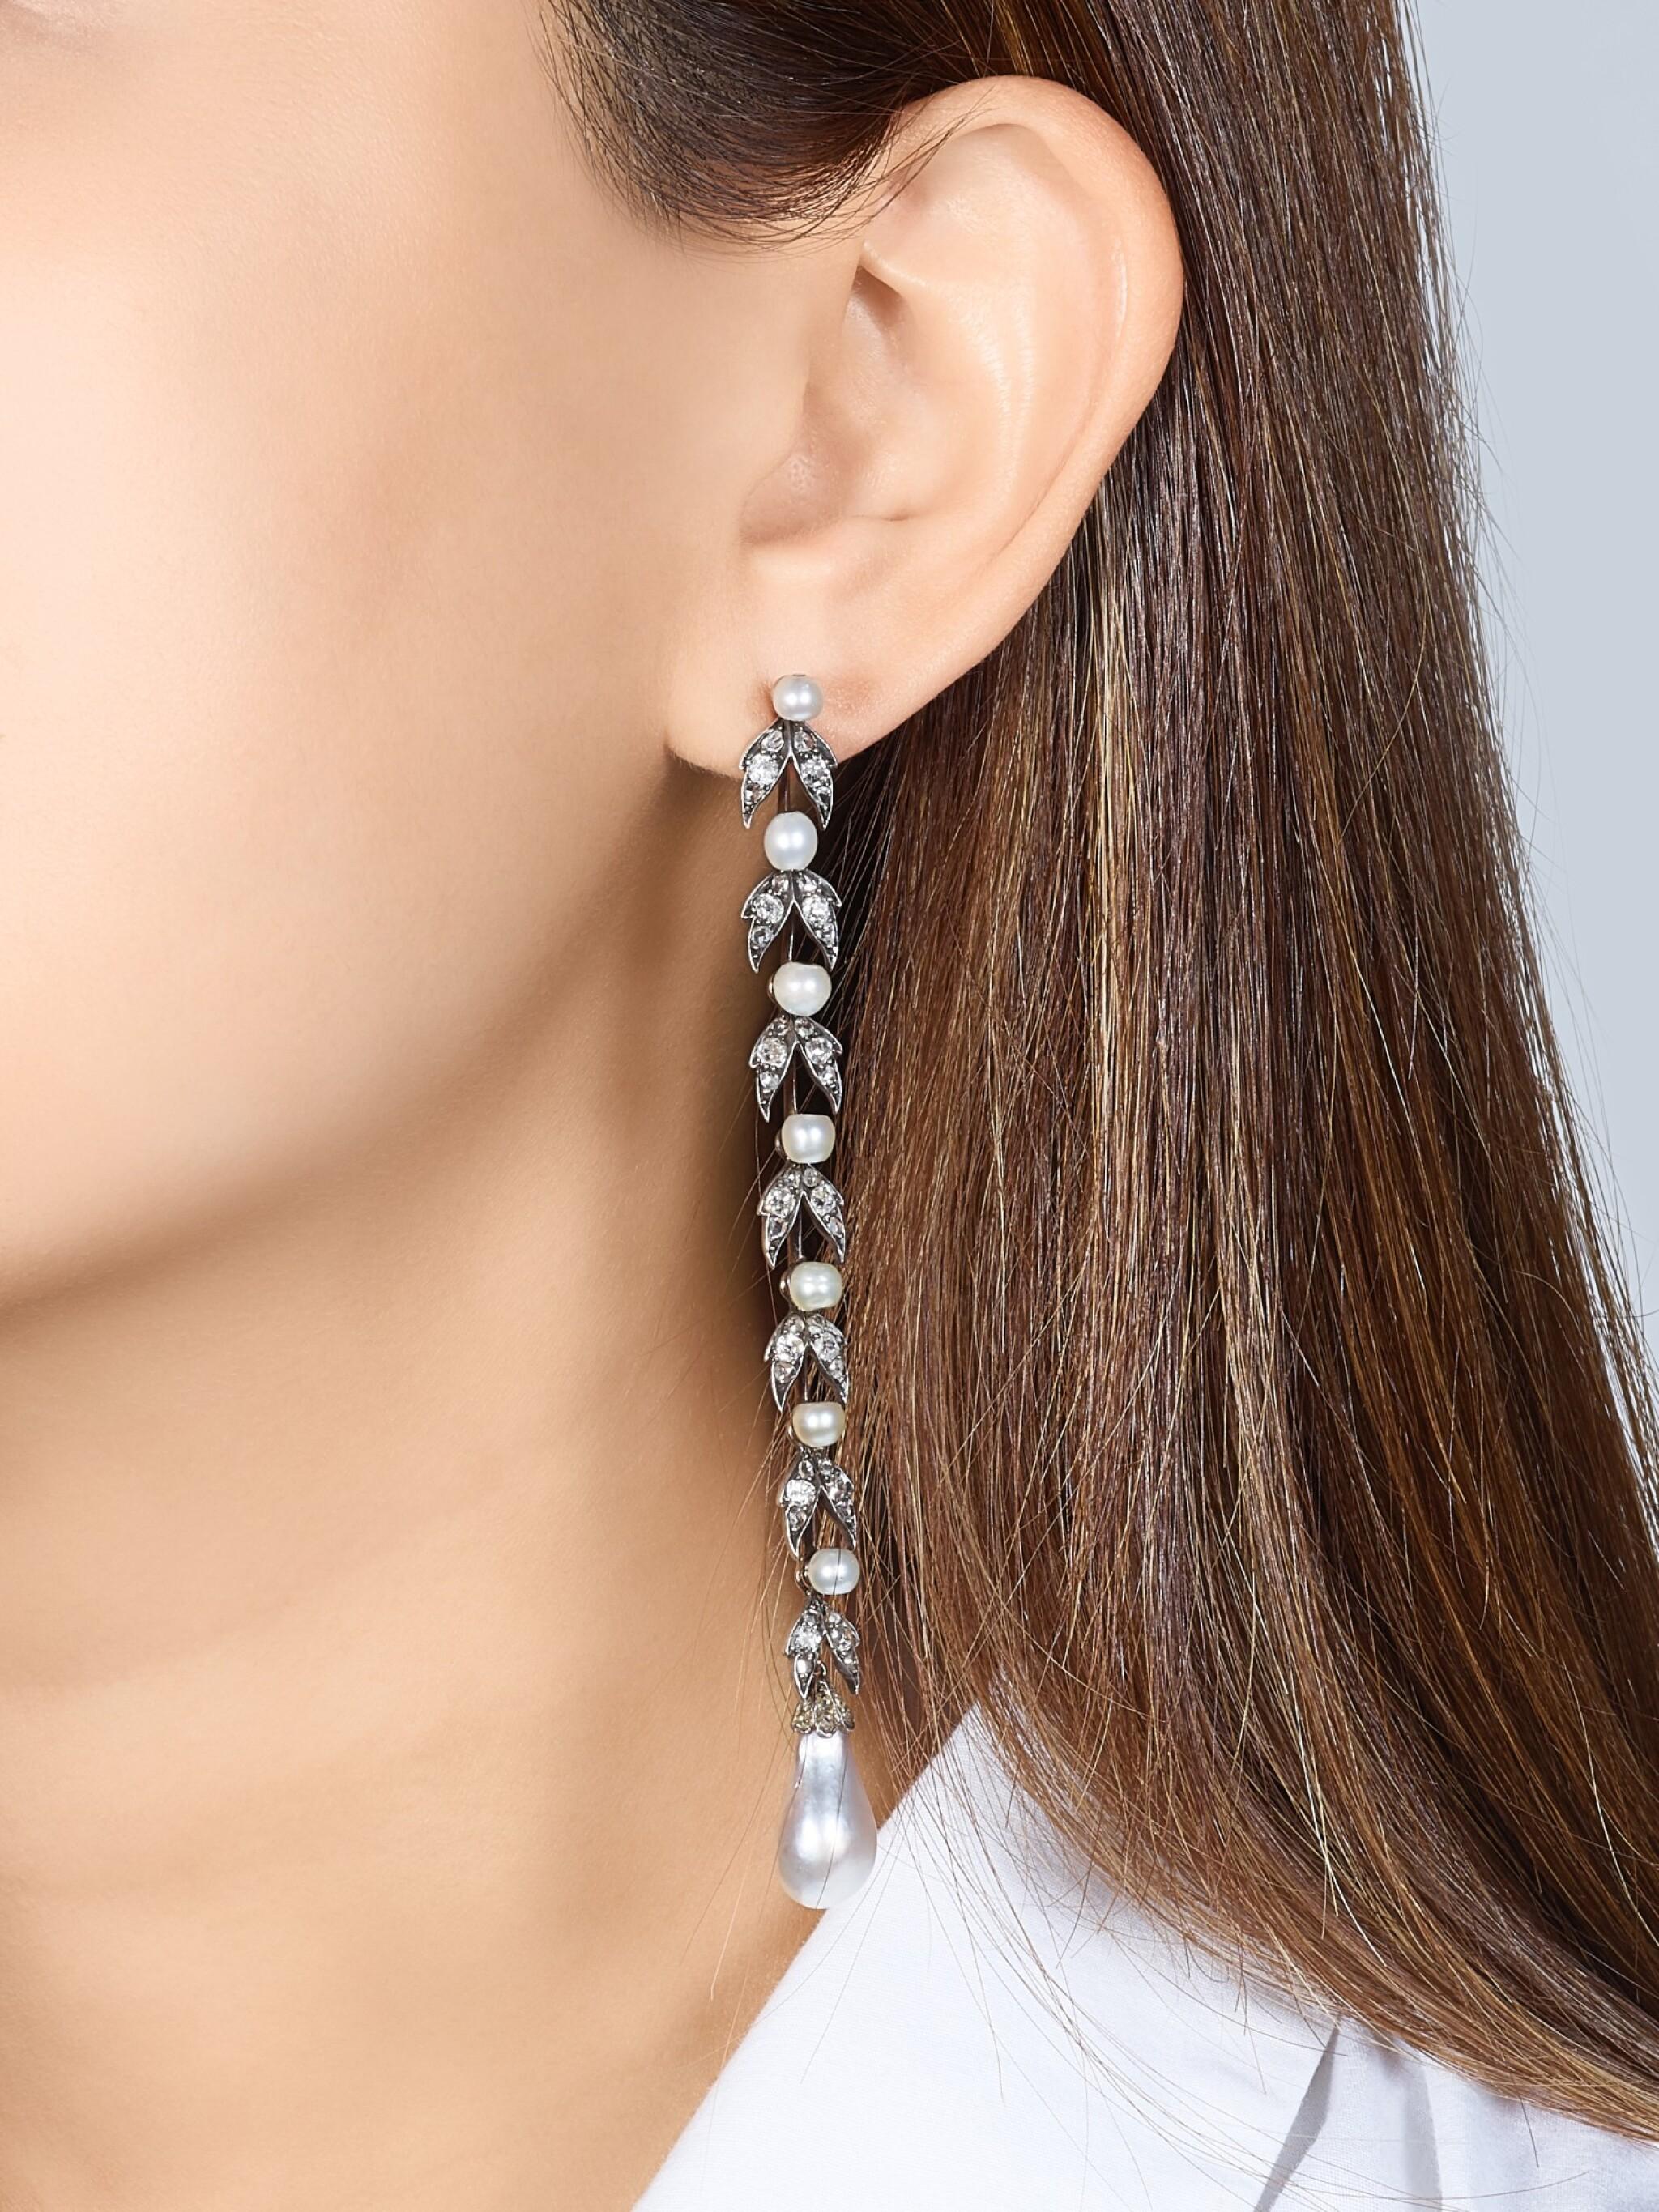 View full screen - View 1 of Lot 9015. Natural Pearl and Diamond Earrings, 19th Century |  天然海水珍珠 配 鑽石 耳墜一對, 19世紀.